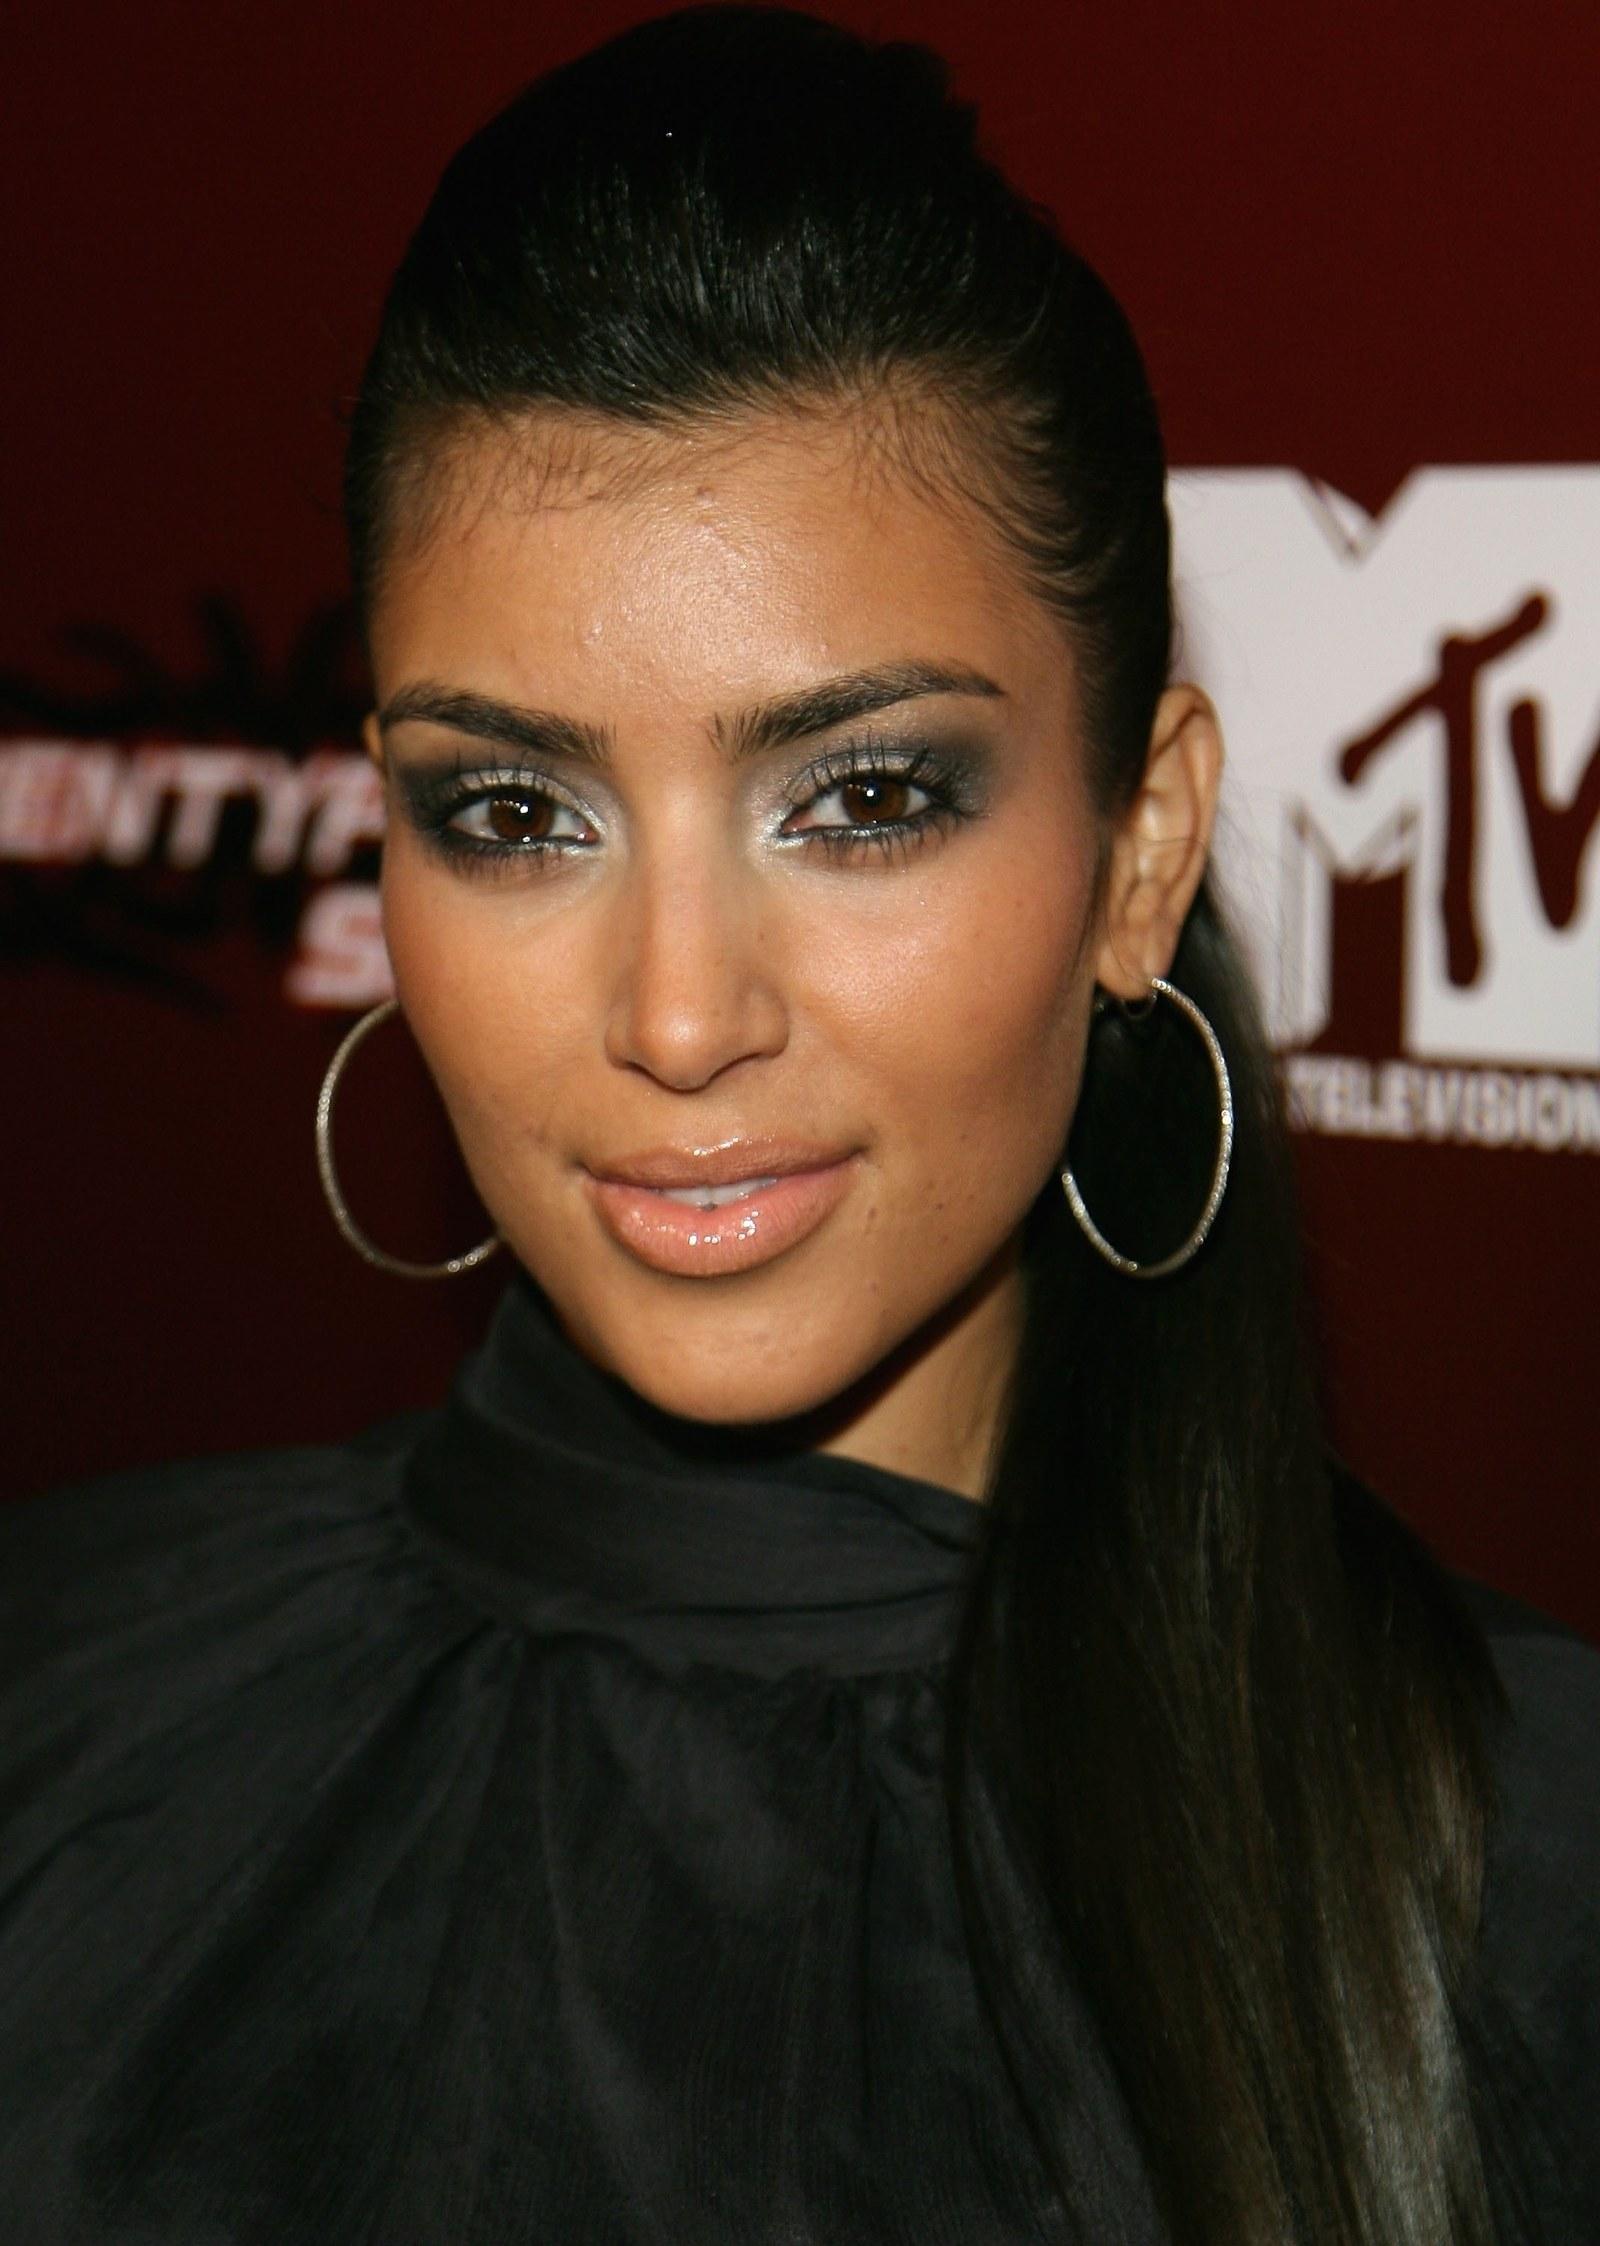 Kim Kardashian In 2006, Before Her TV Show.